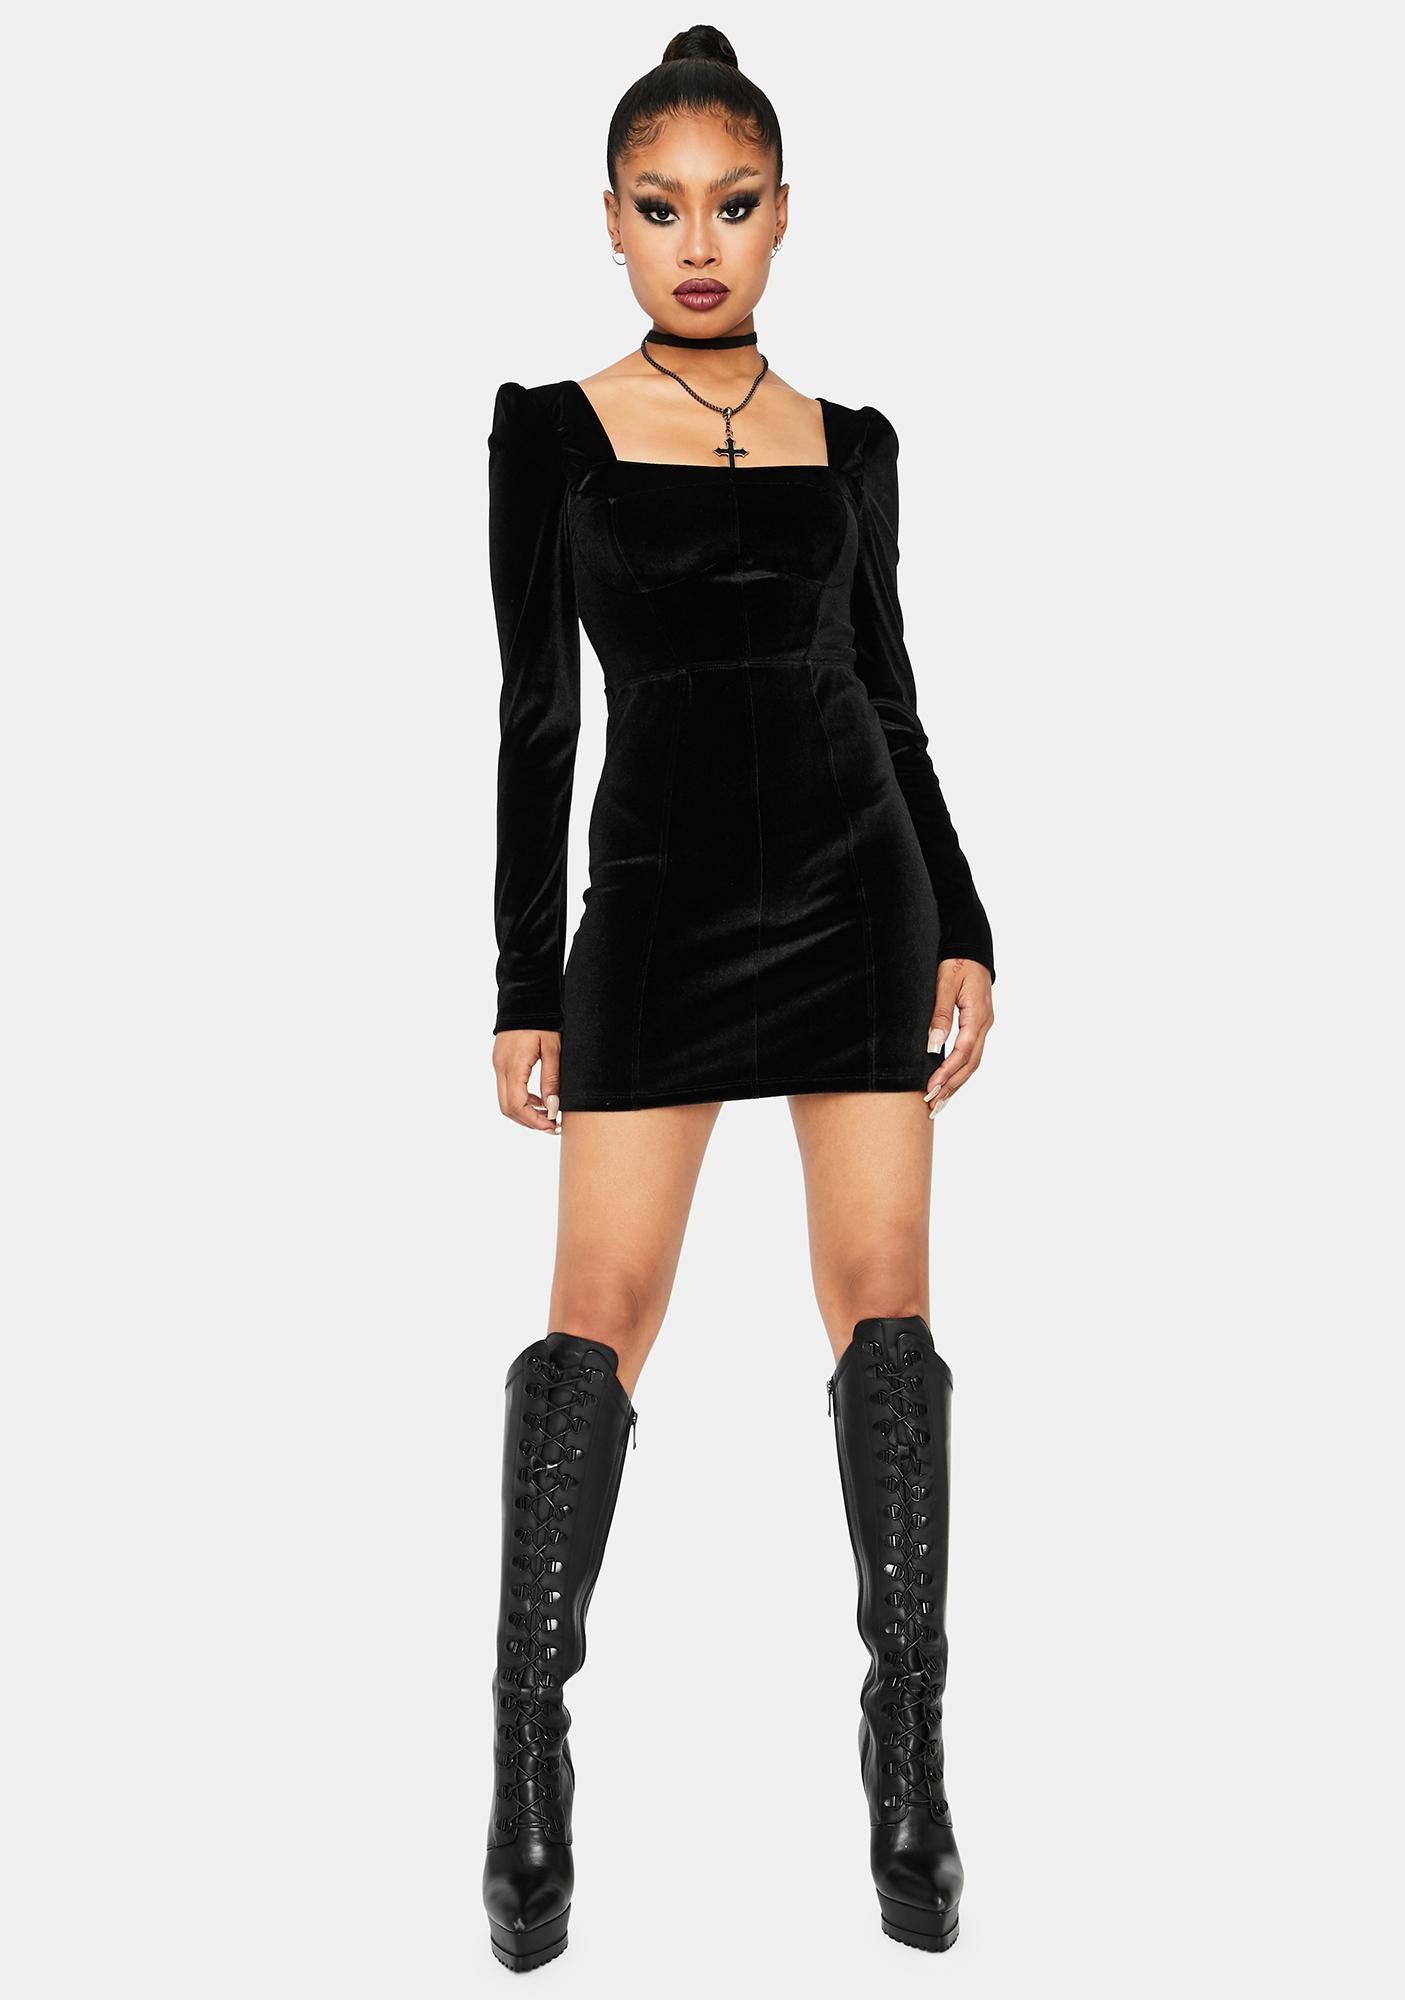 Kiki Riki Hot Girl Haunting Velvet Mini Dress